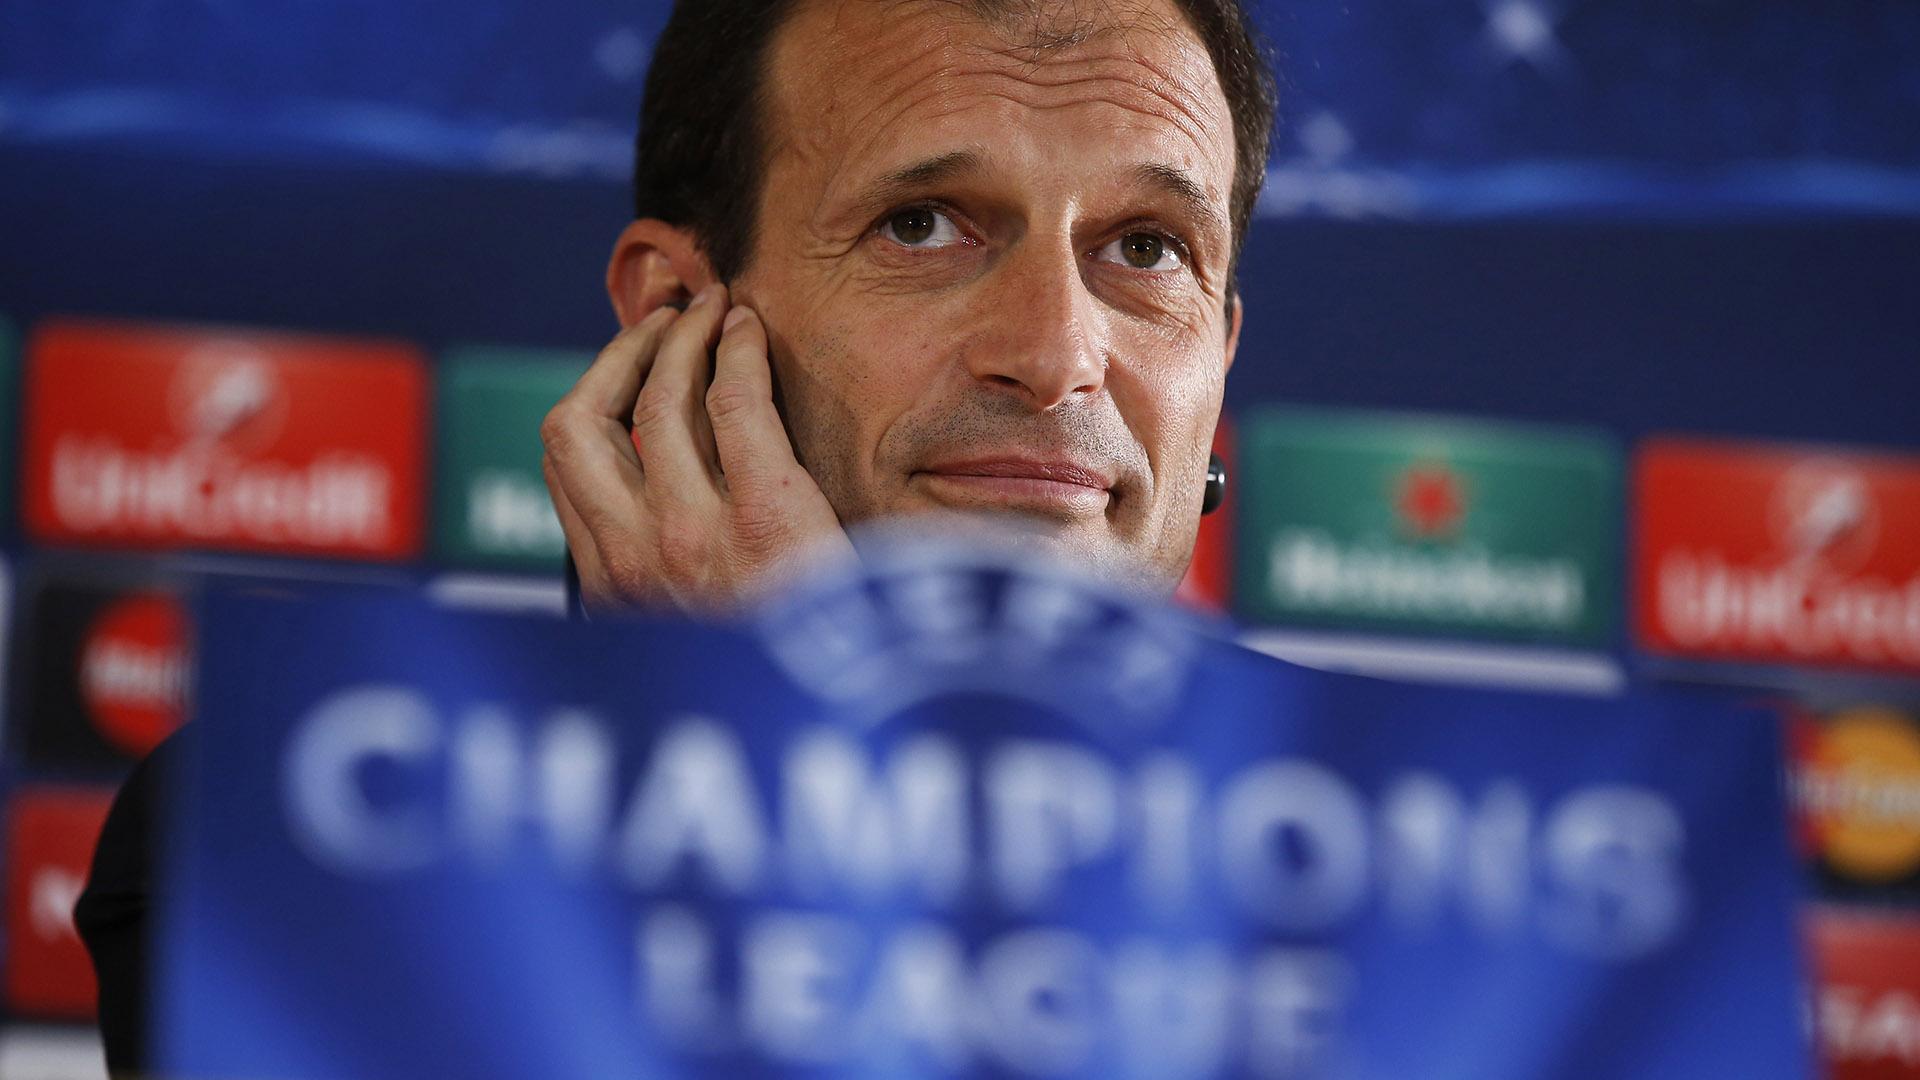 Image Result For En Vivo Sampdoria Vs Juventus En Vivo Goal Chicharito